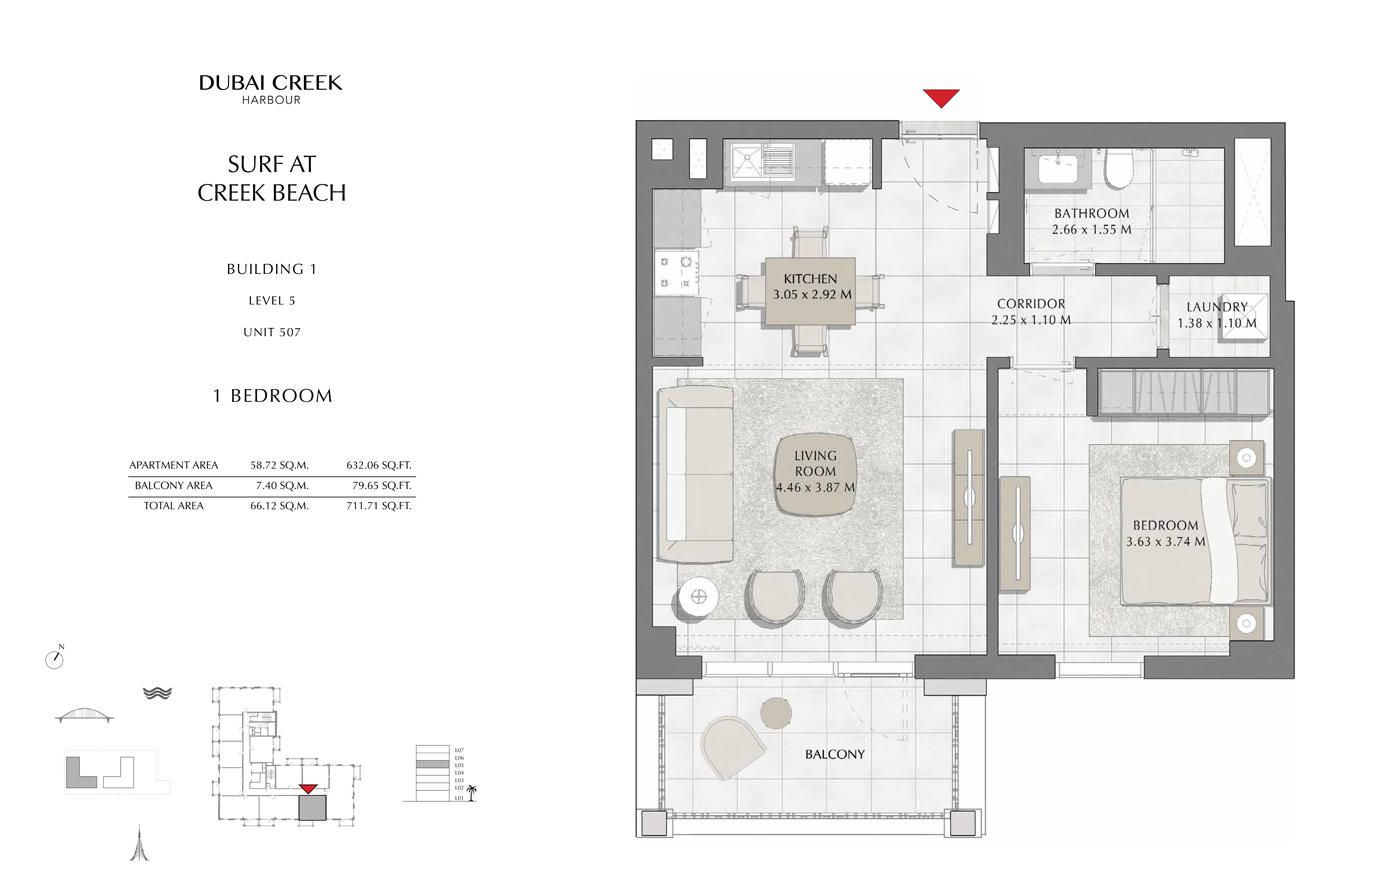 Building 1, 1 Bedroom, Level 5, Size 711 Sq Ft